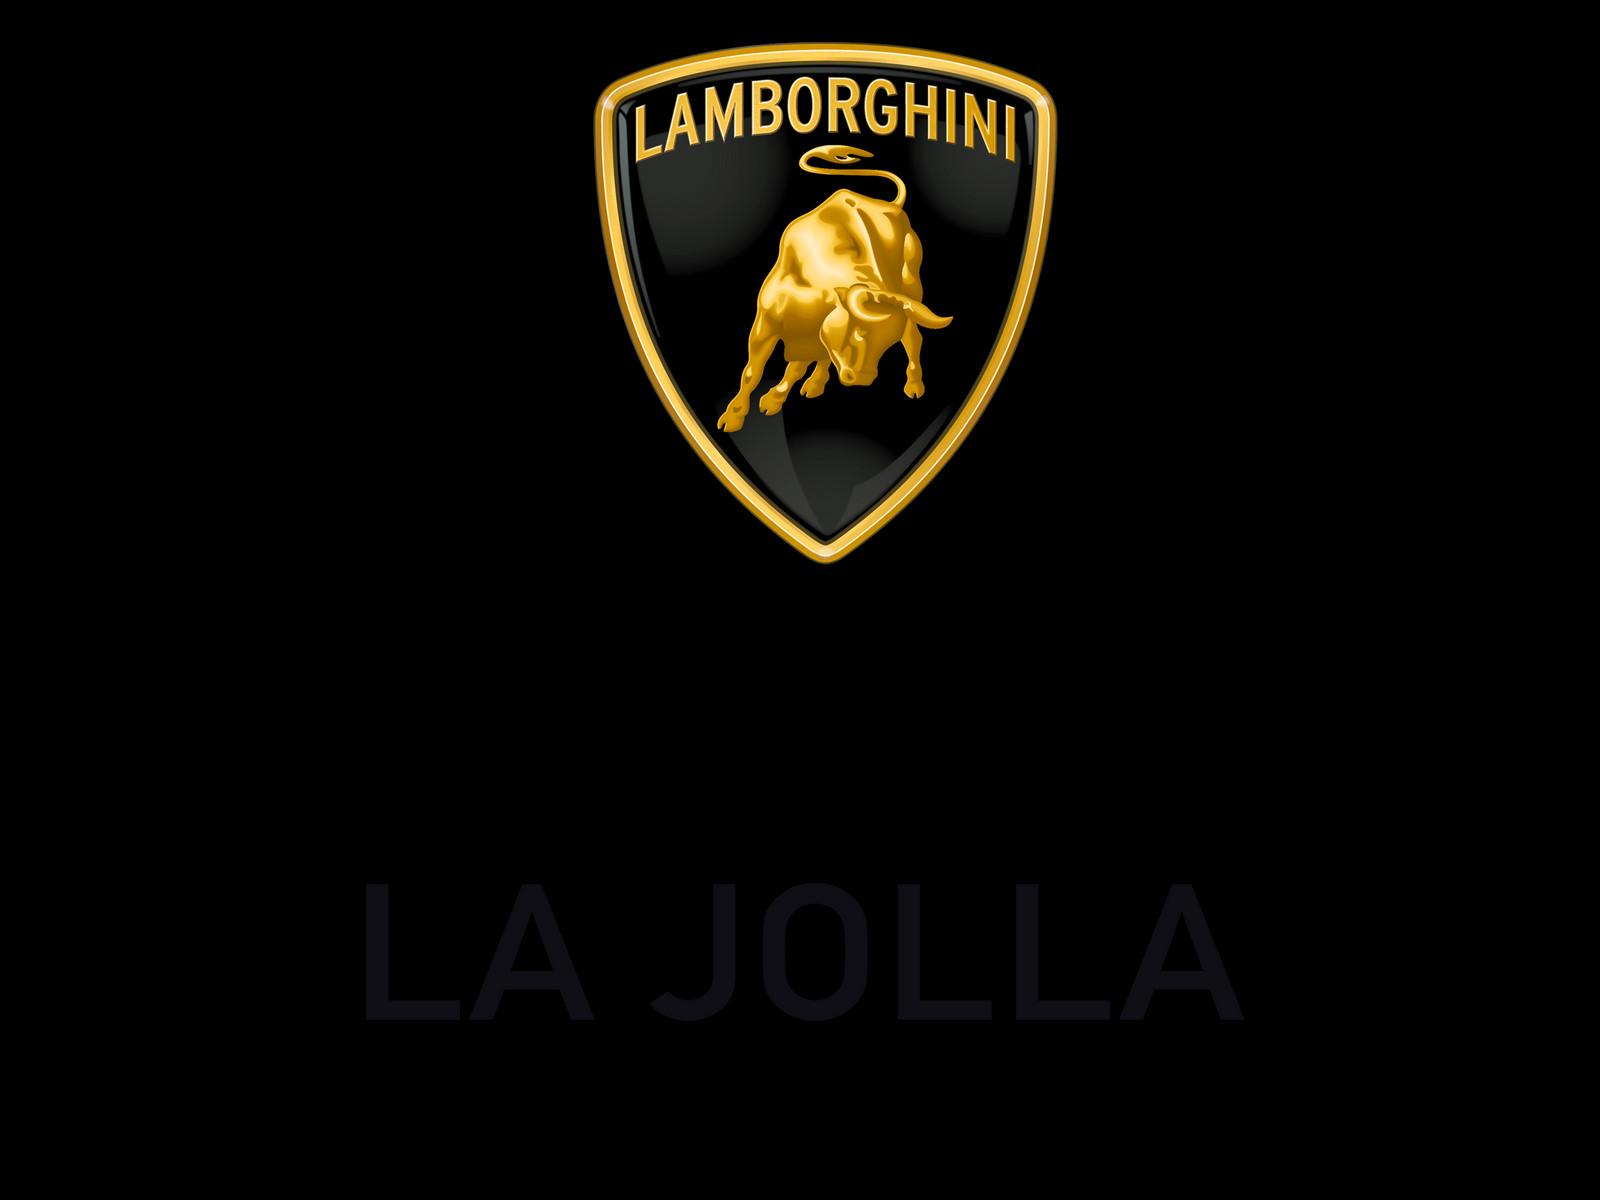 Logo Lamborghini La Jolla Black Png